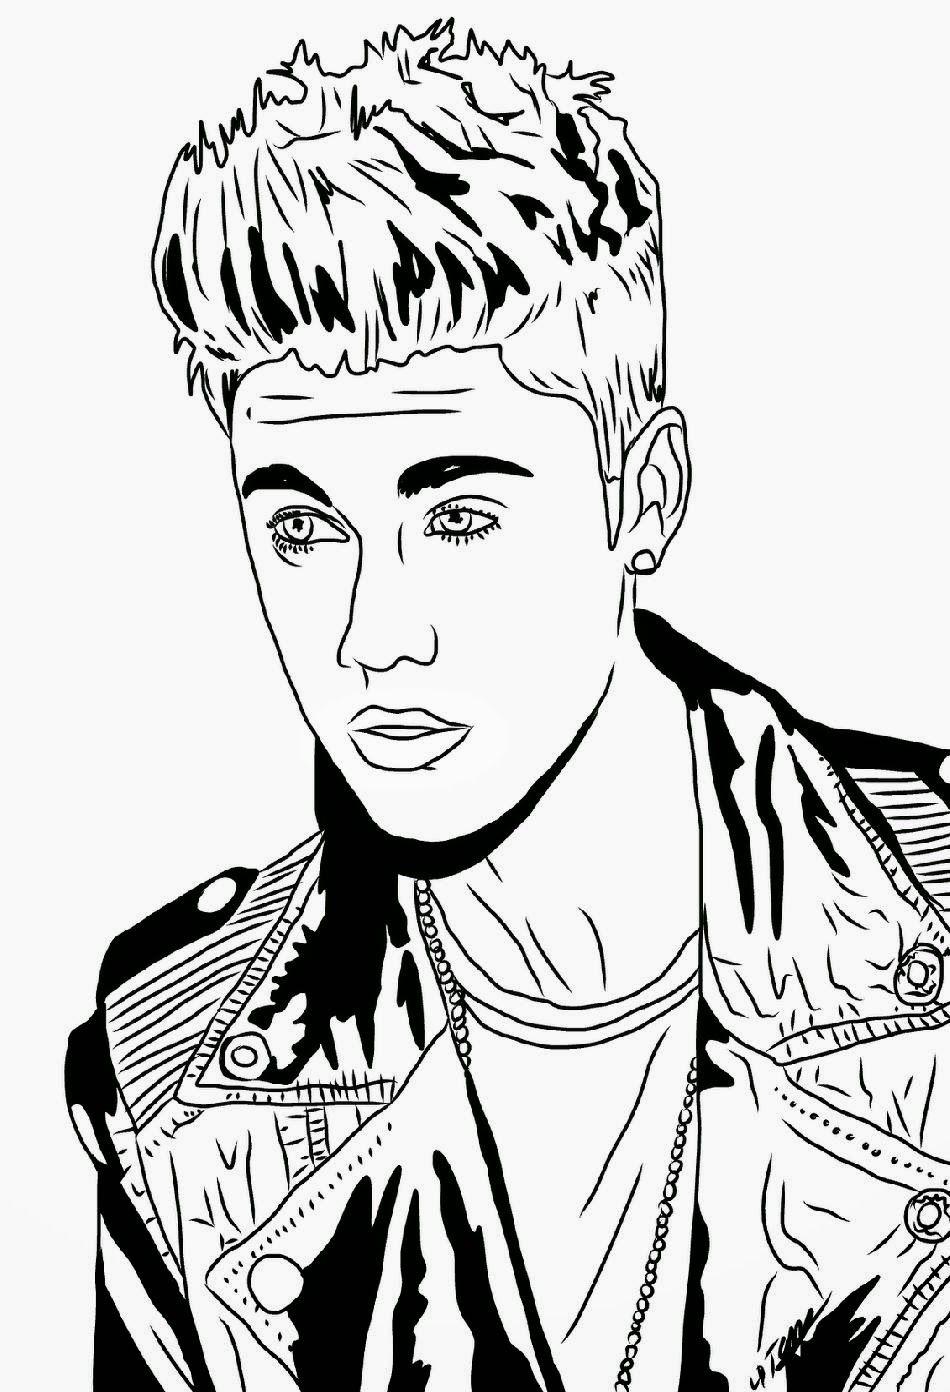 Free coloring sheets justin bieber - Justin Bieber Coloring Sheets Free Coloring Page